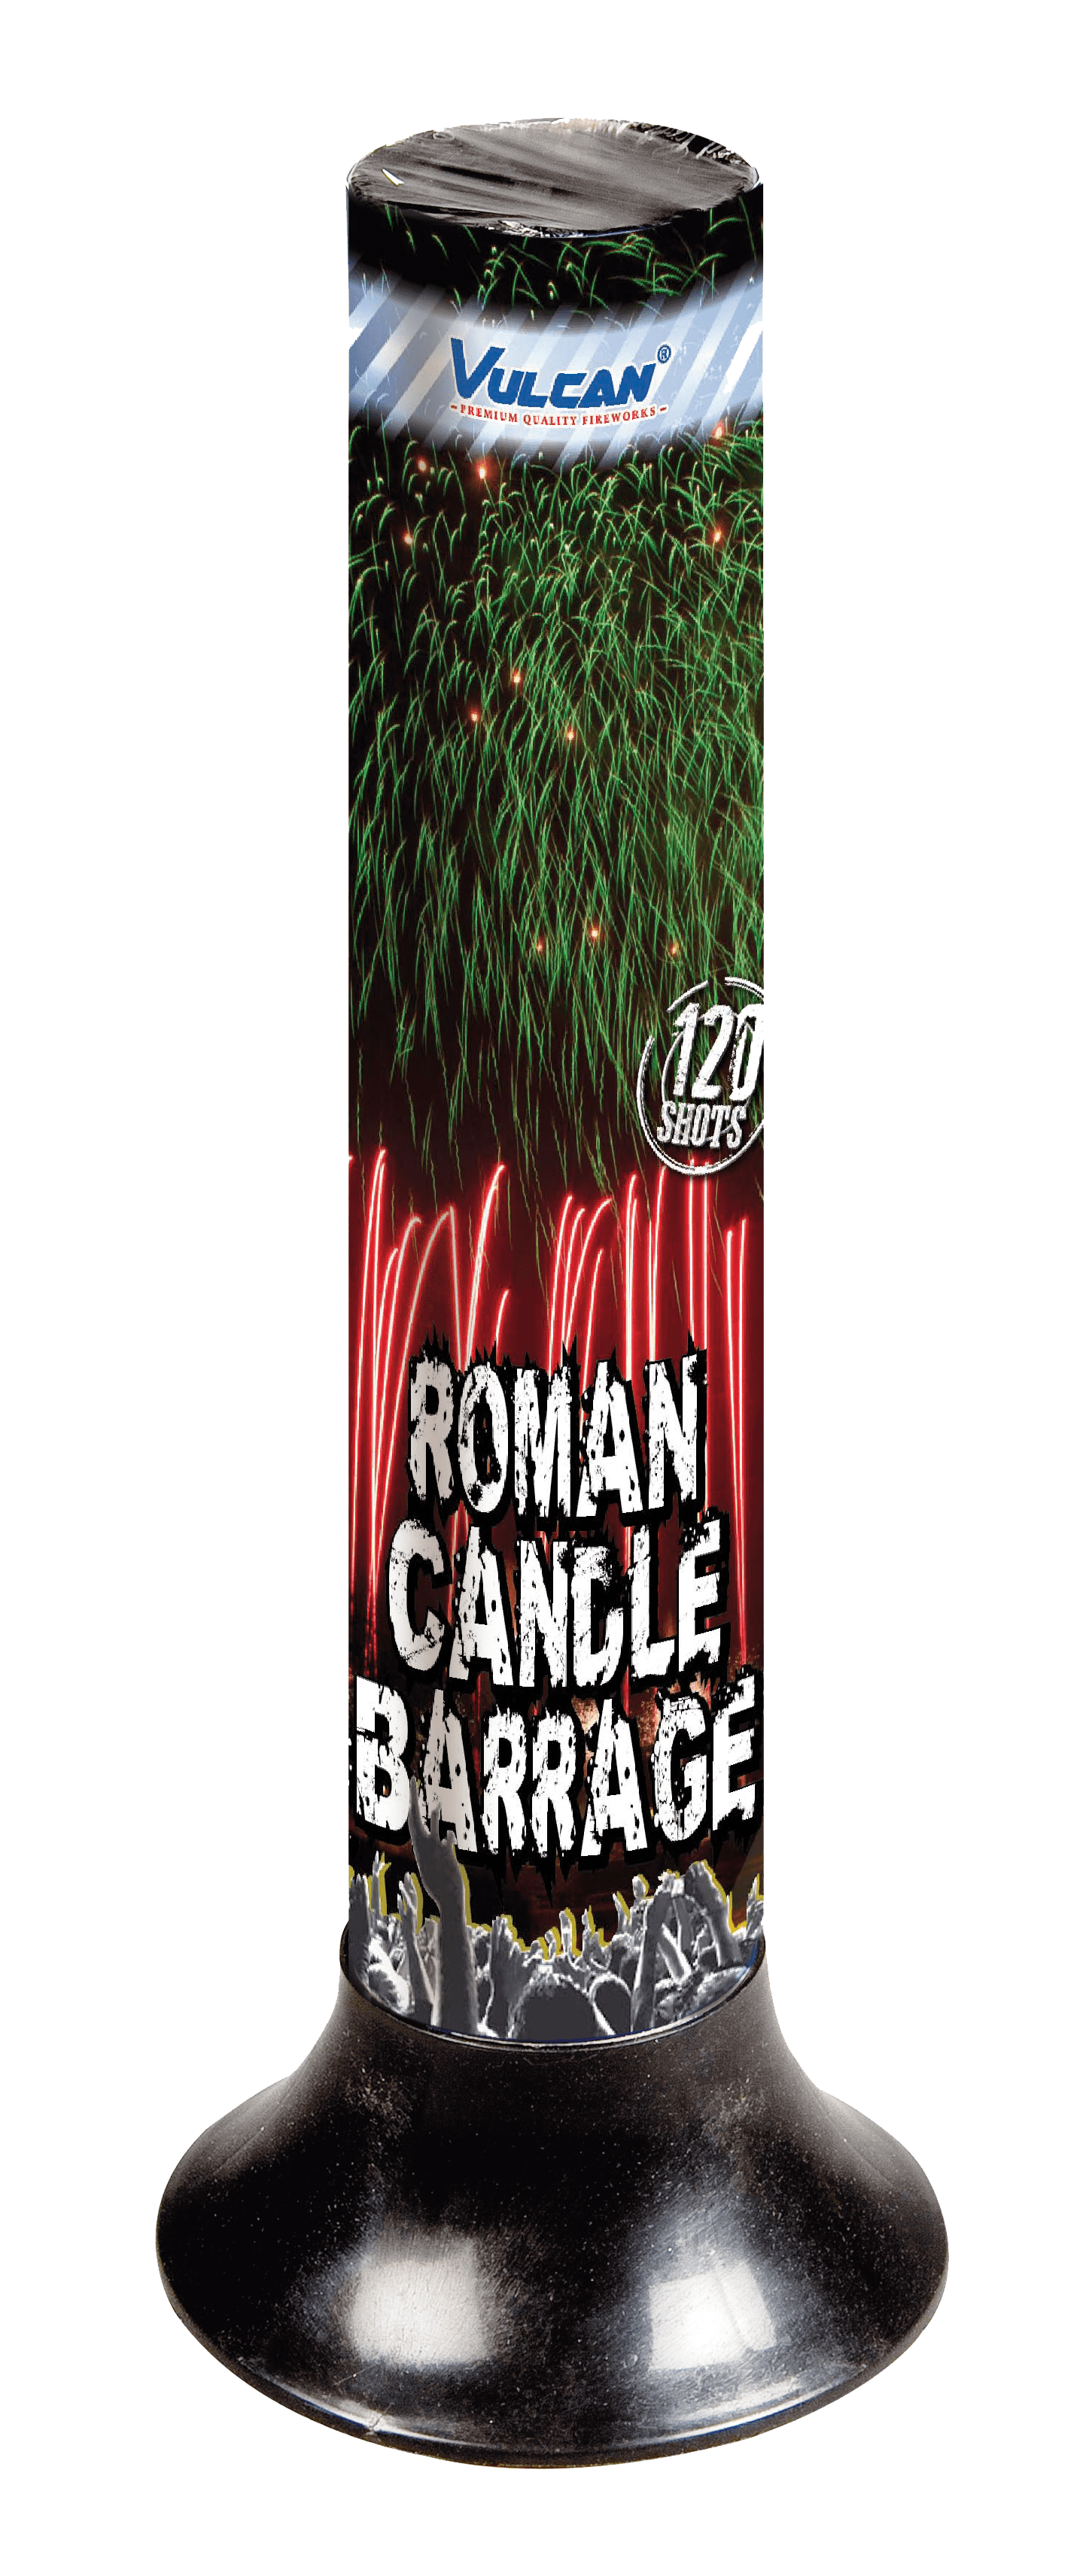 Candle Barrage 120 shots